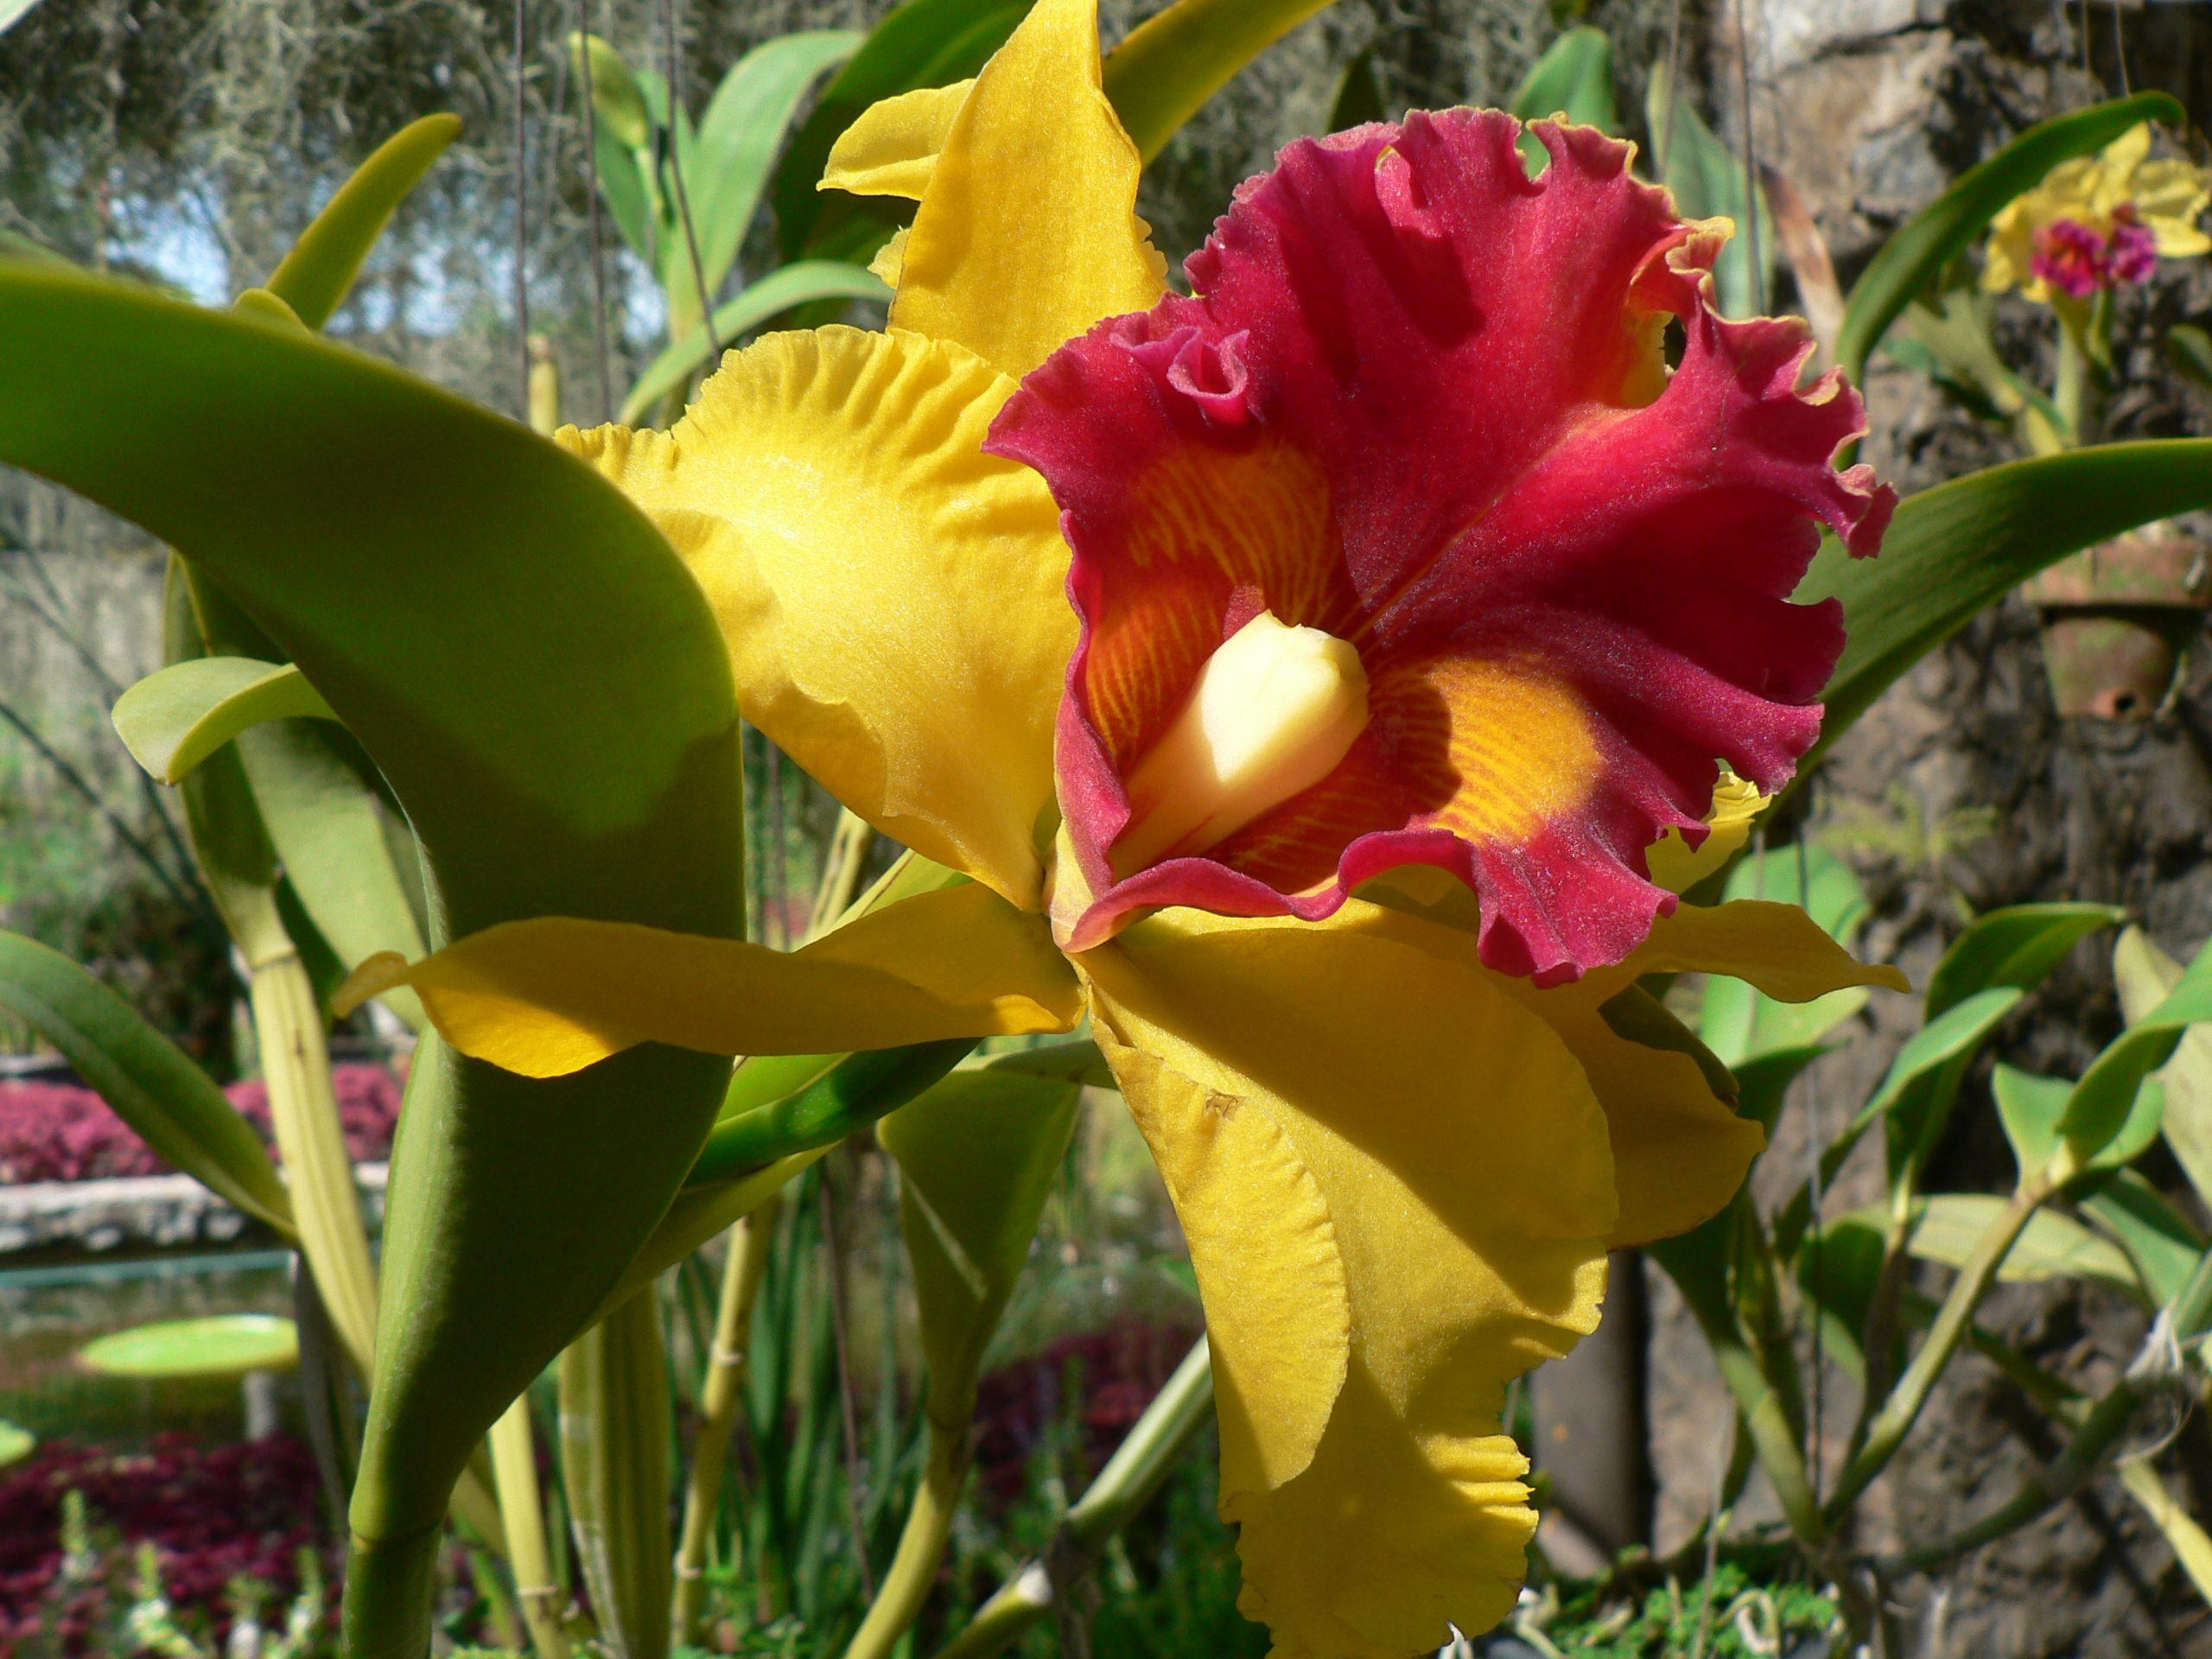 Garden orchids